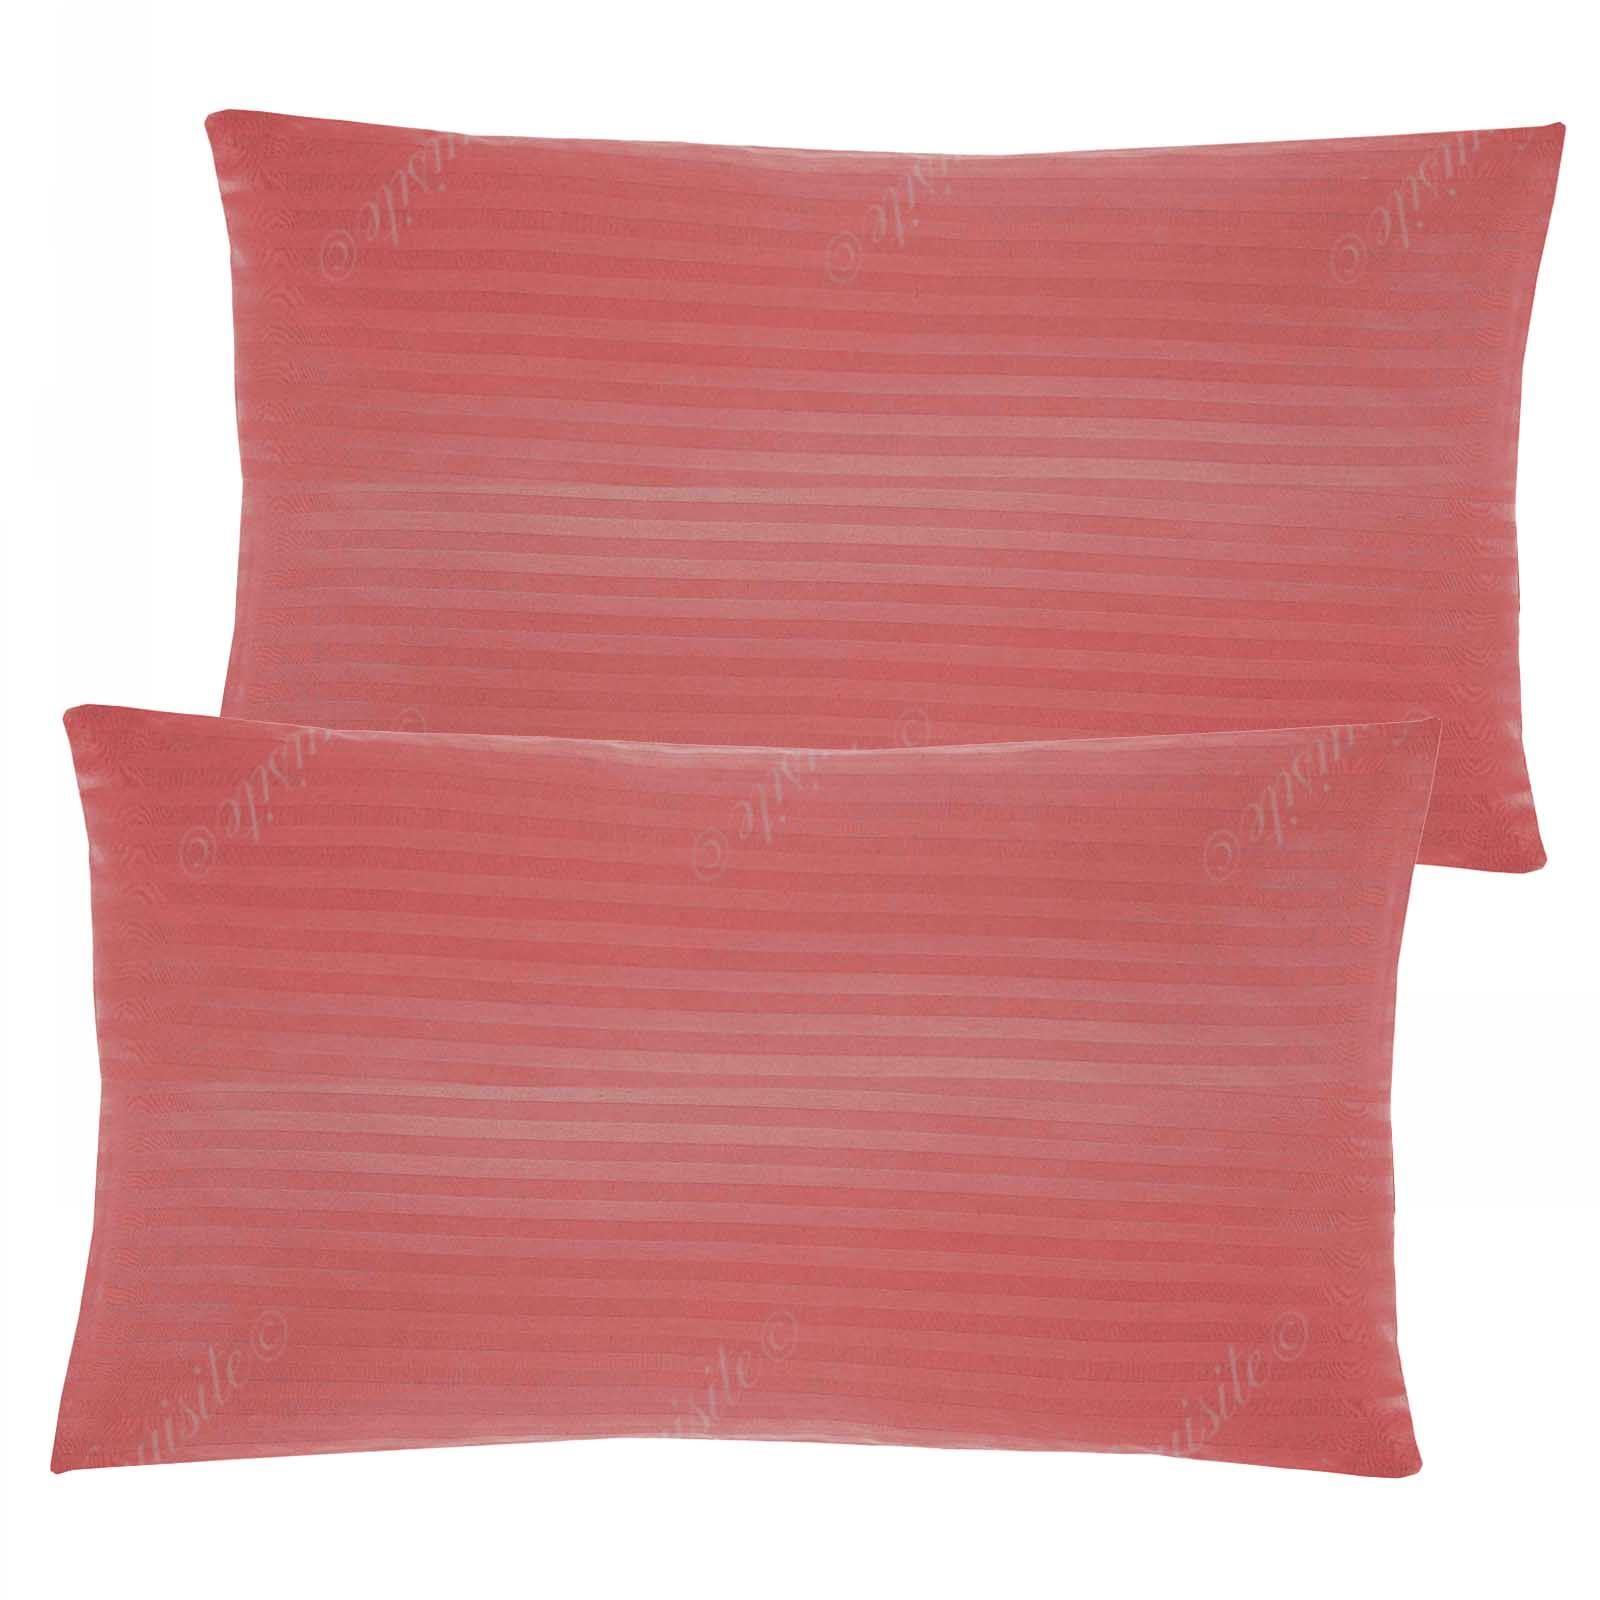 100 cotton luxury duvet cover set pillow case bedding single double king size ebay. Black Bedroom Furniture Sets. Home Design Ideas